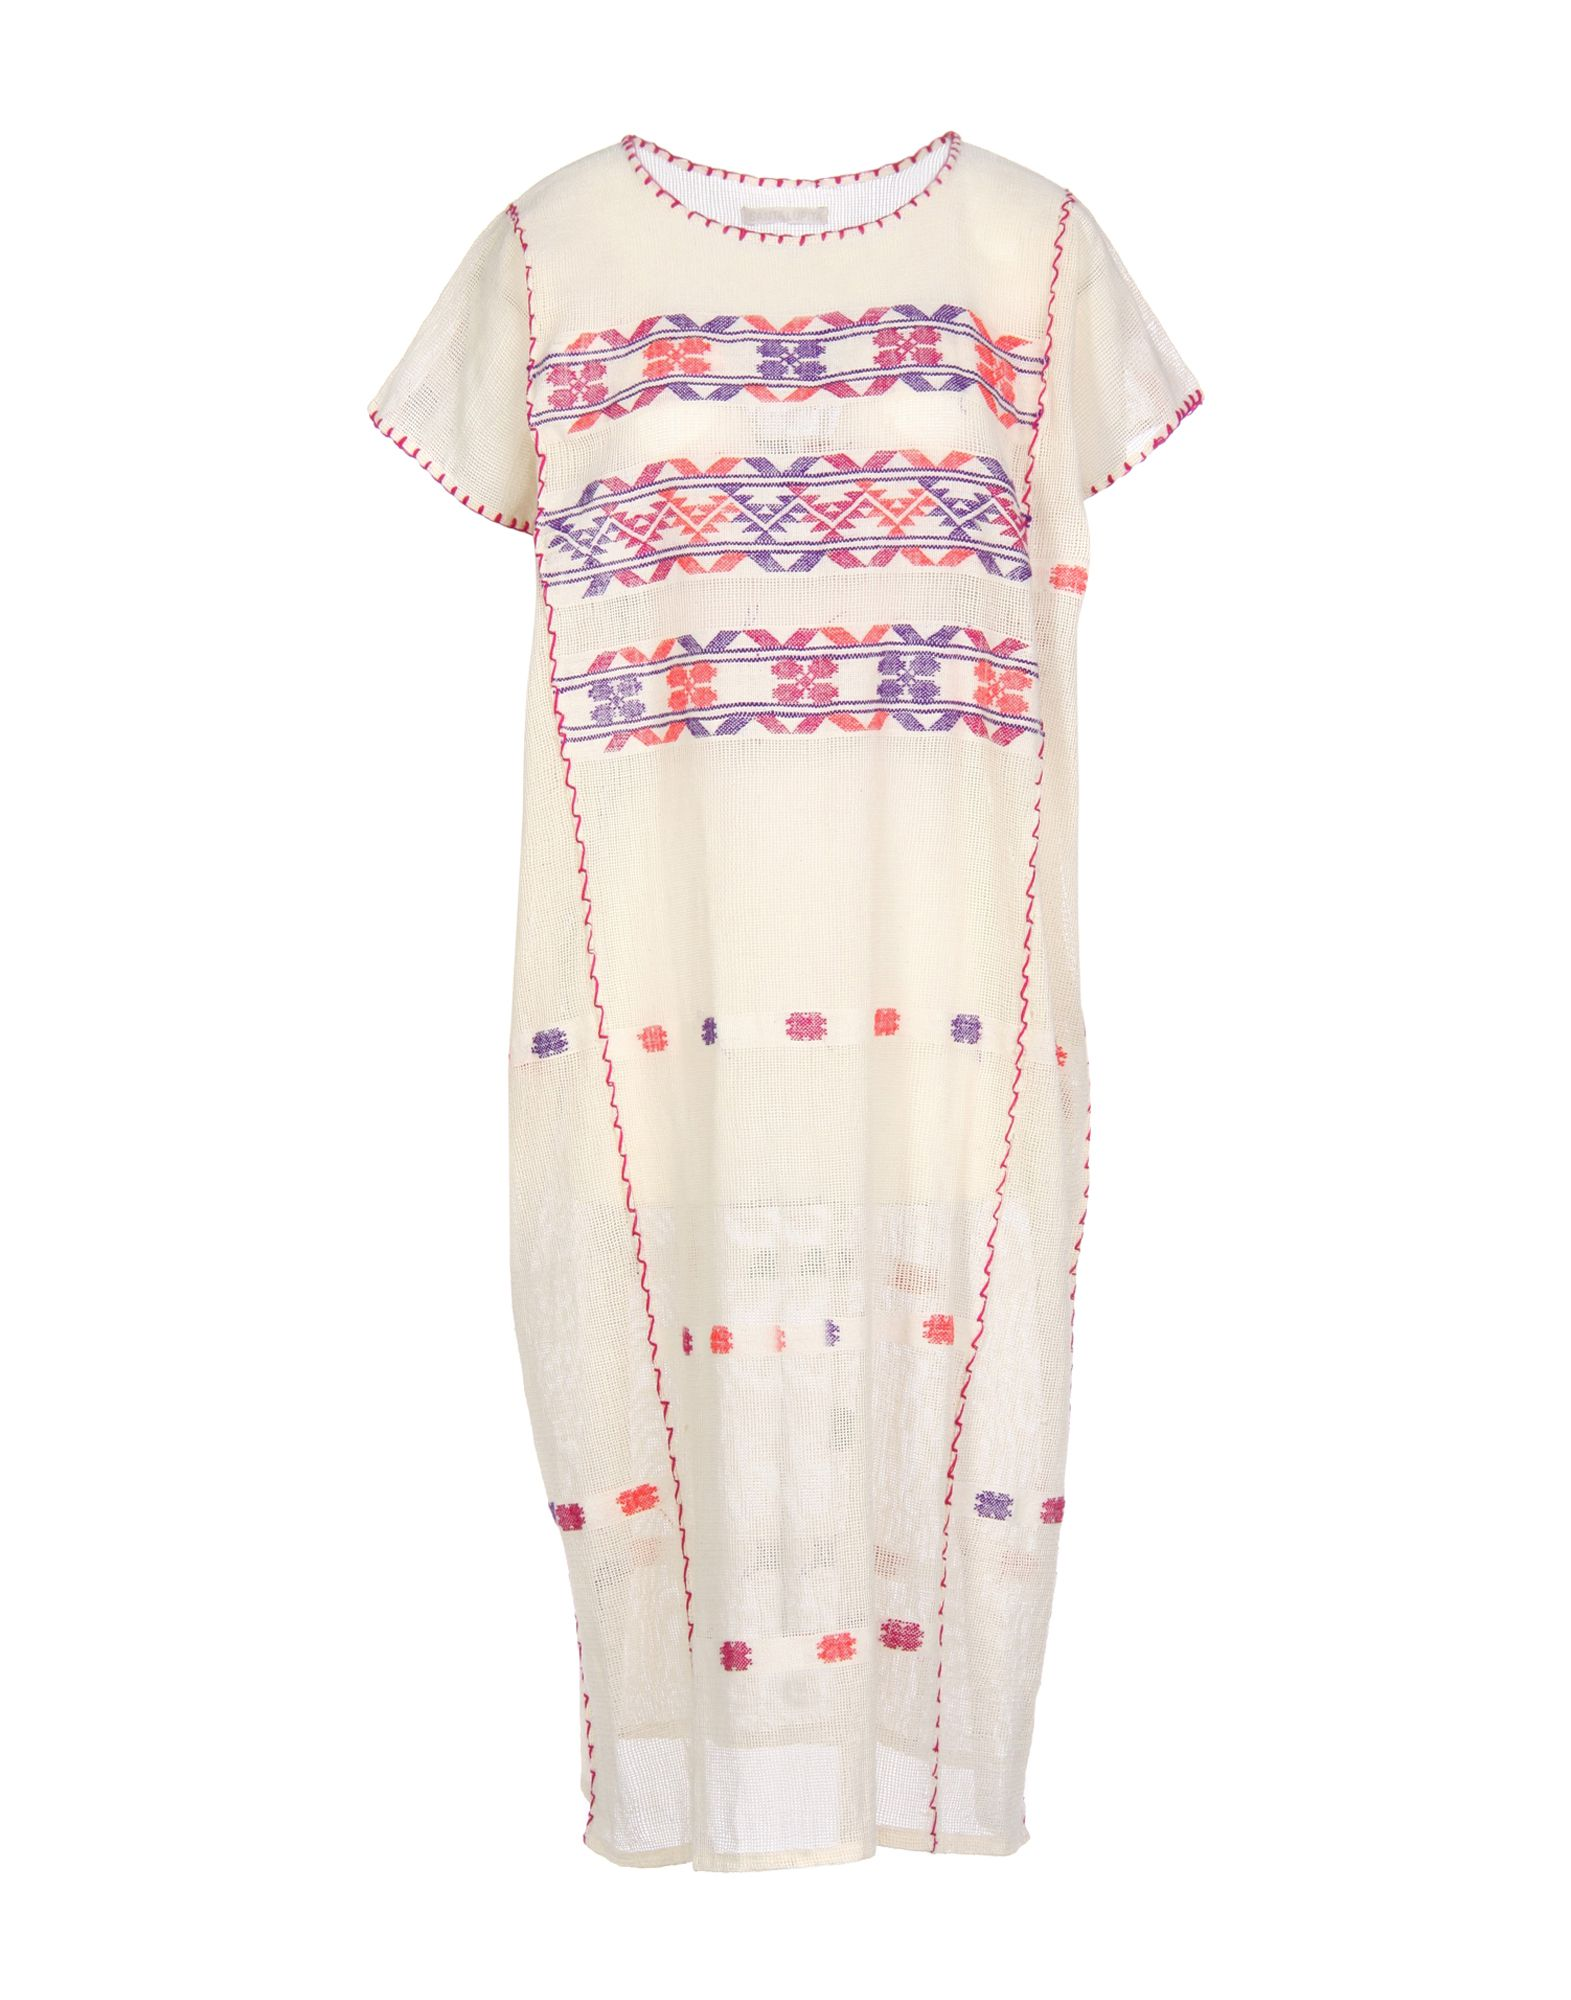 SANTA LUPITA Knee-Length Dress in Ivory